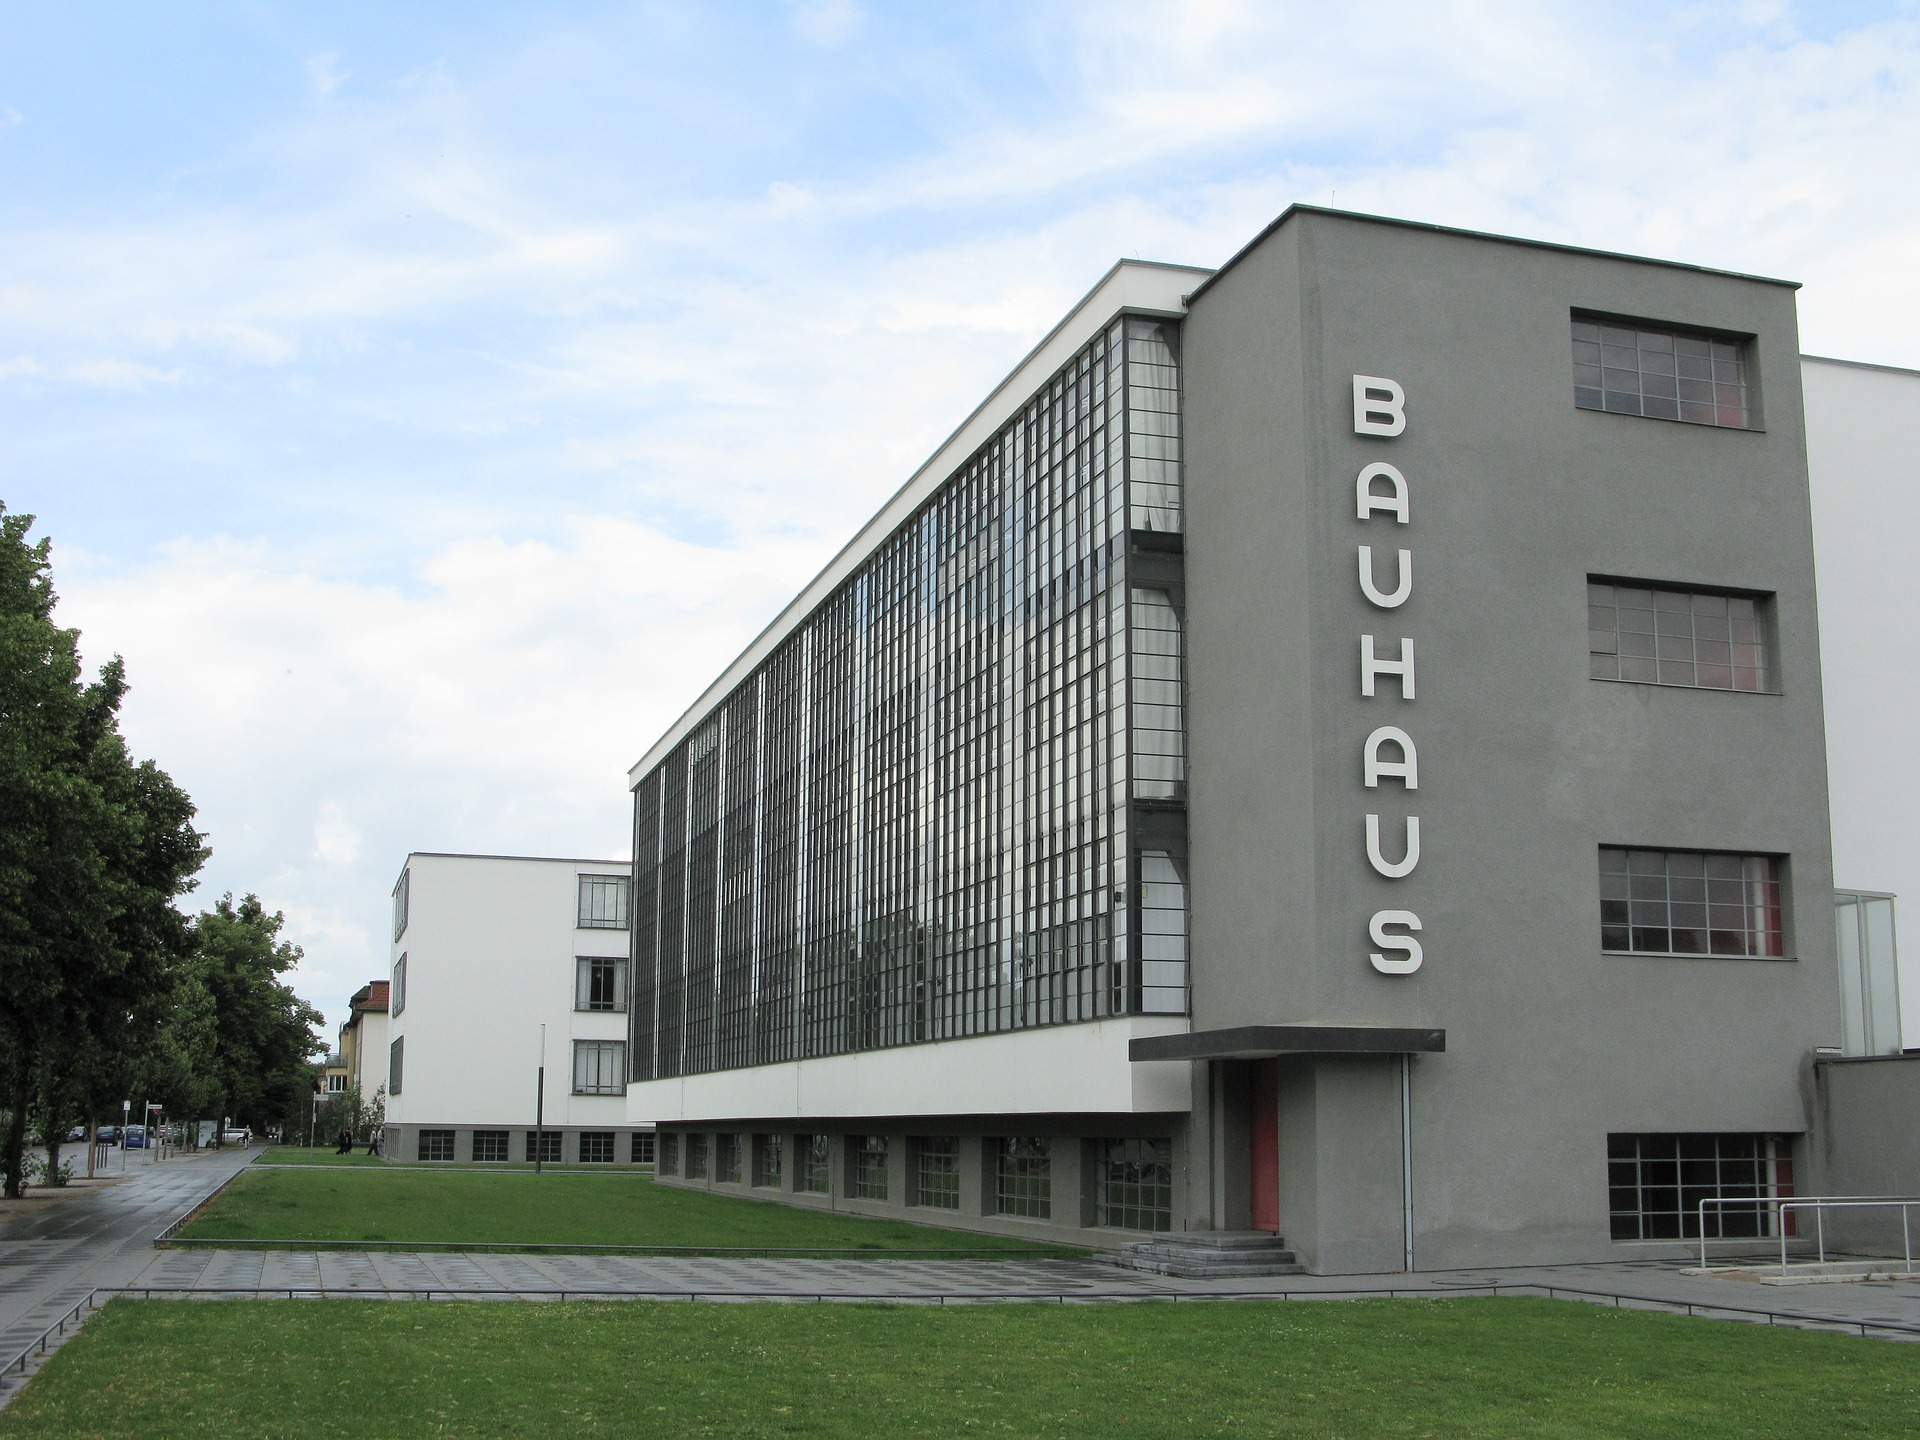 Bauhaus architecture - Dessau school